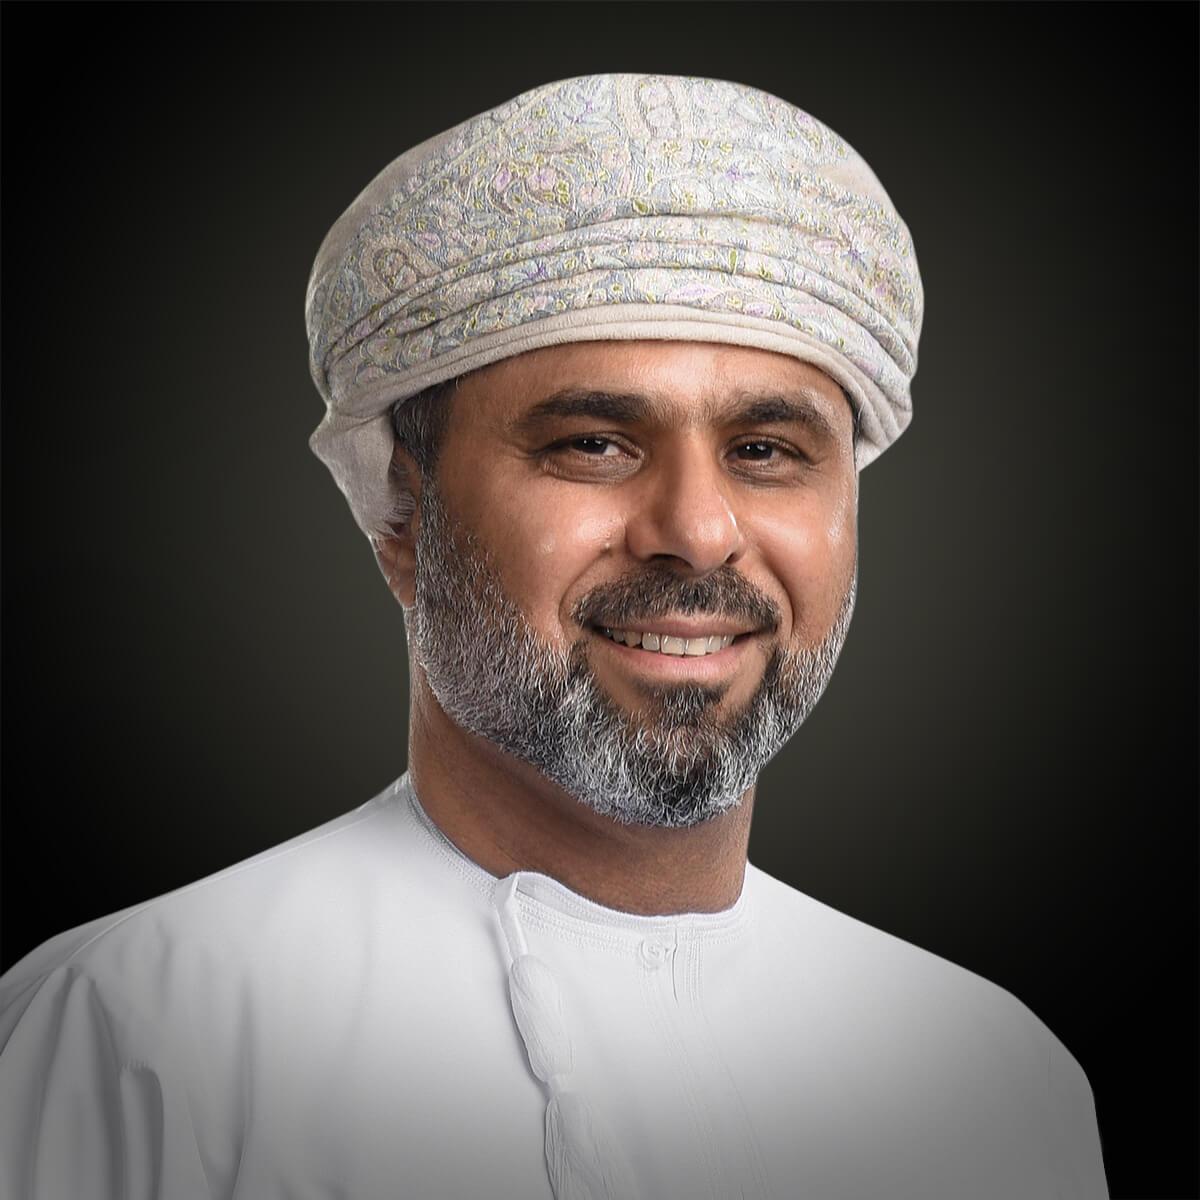 Oman Environmental Services Holding Company (be'ah)